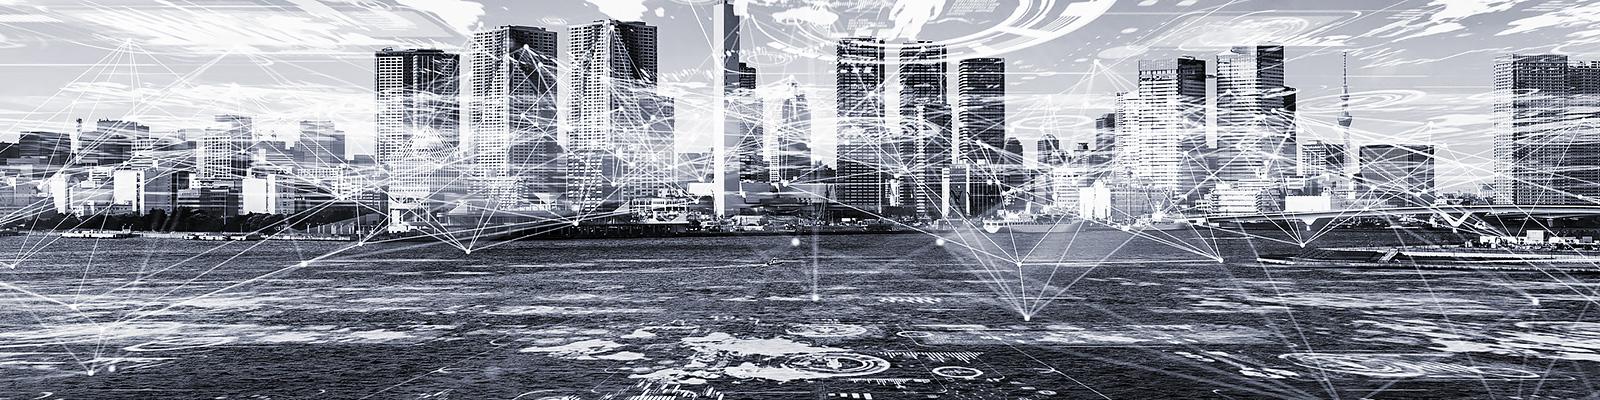 GPS 位置情報 都市 精密 イメージ